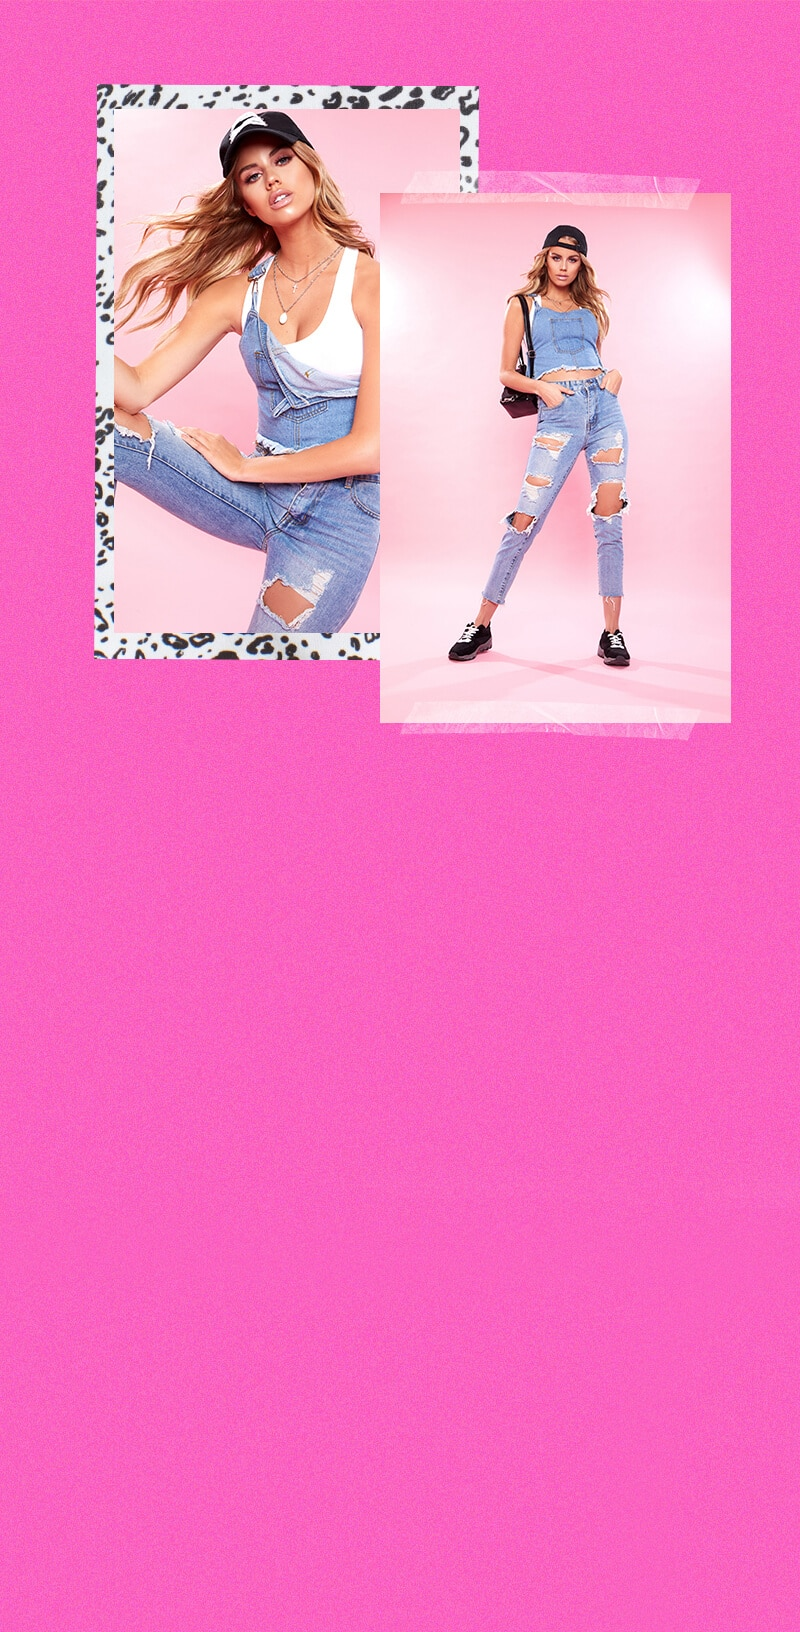 blue denim top & denim jeans student style image